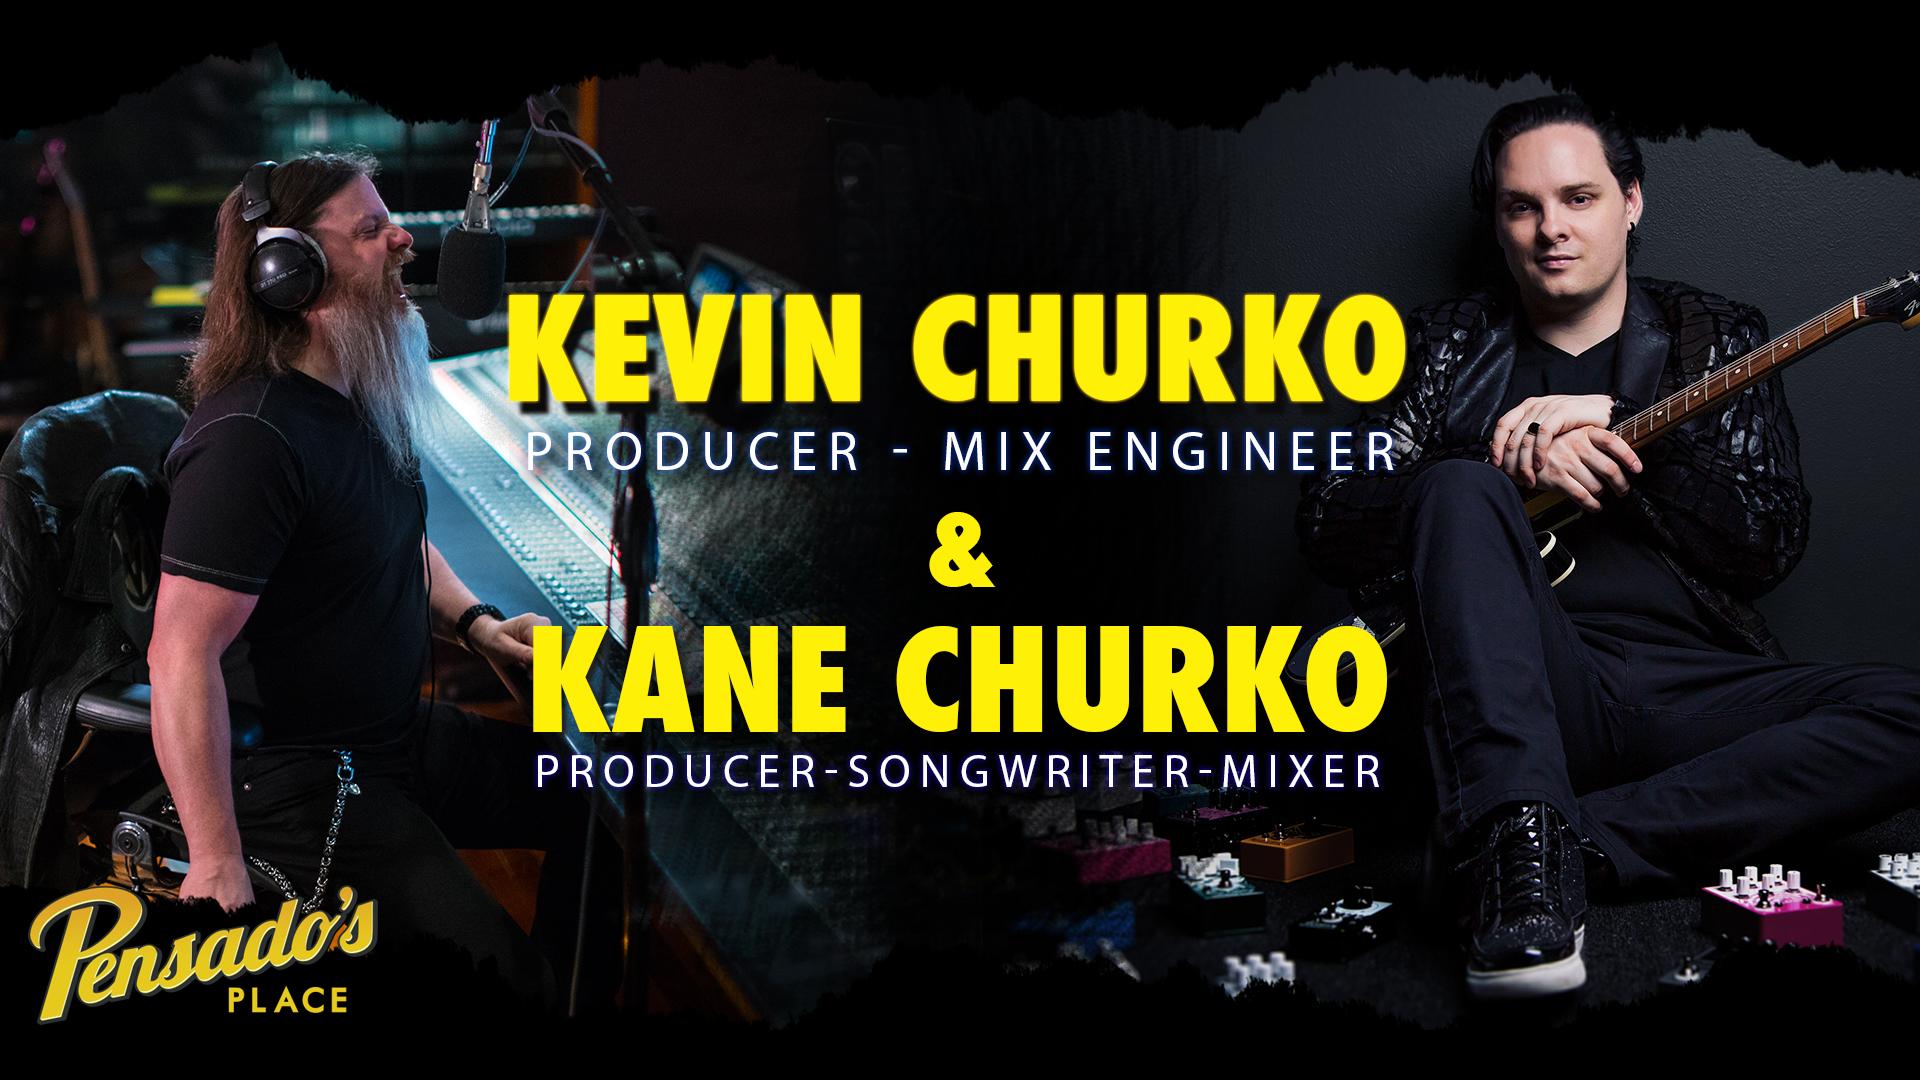 Ozzy Osborne Producers / Engineers, Kevin and Kane Churko